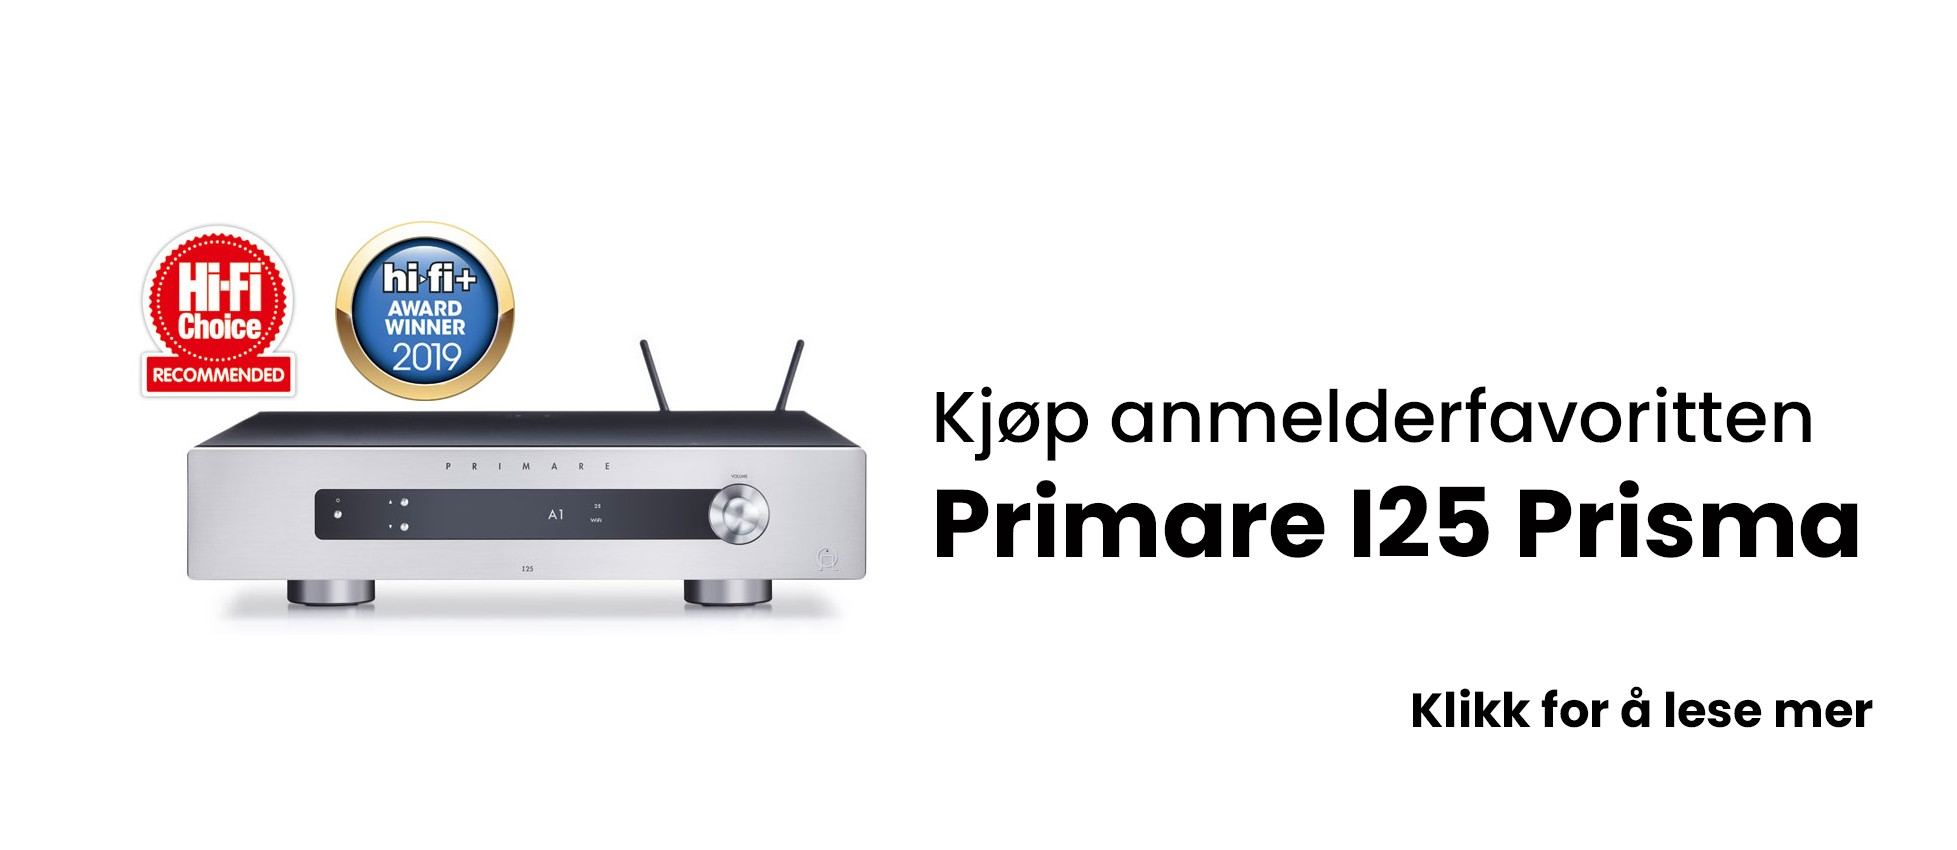 Anmelderfavoritten Primare I25 Prisma